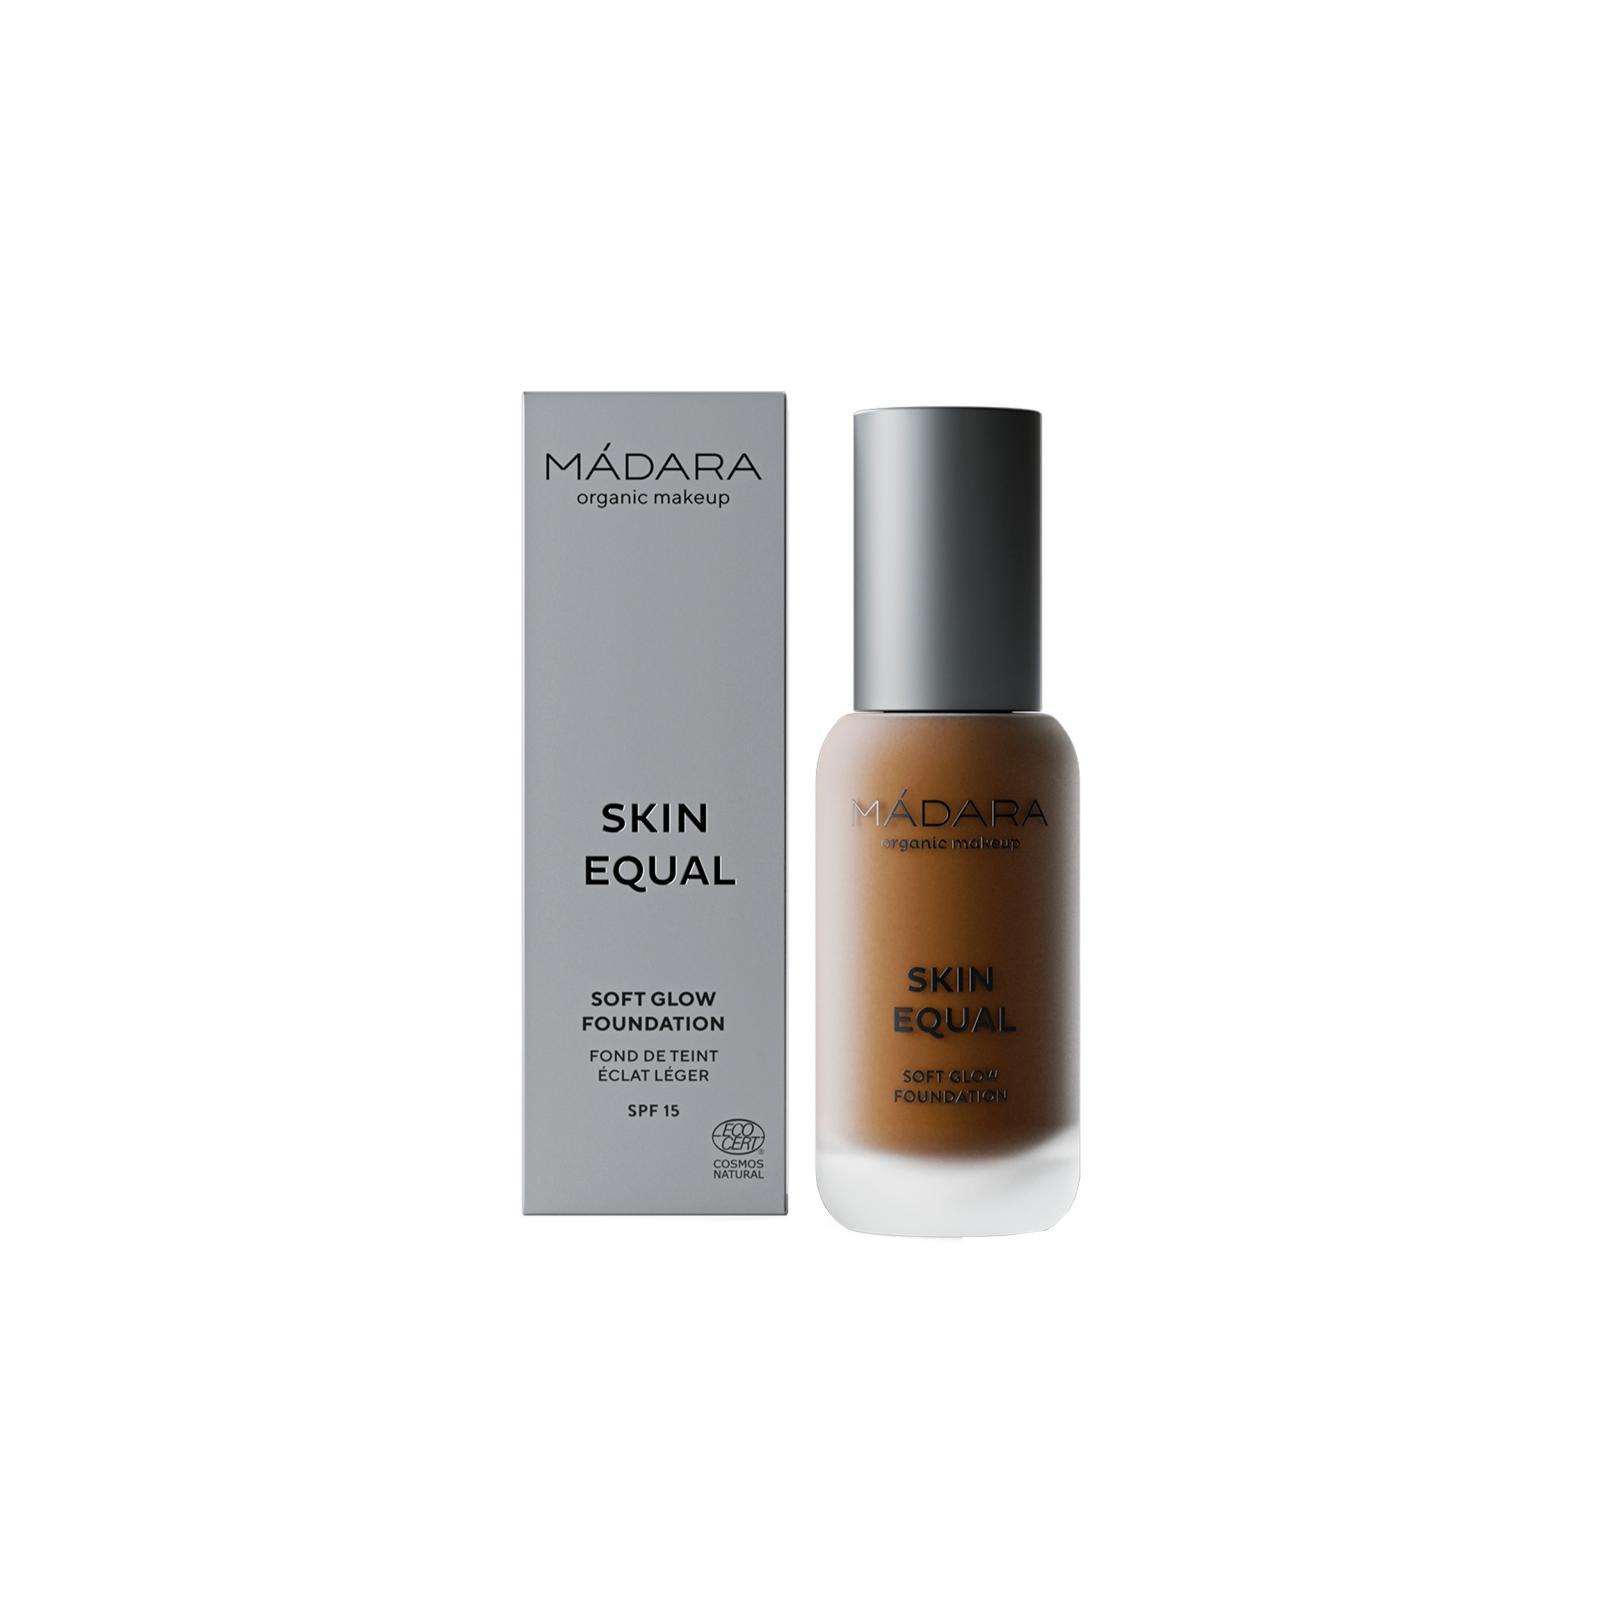 MÁDARA Make-up s SPF 15, Chestnut 90 30 ml